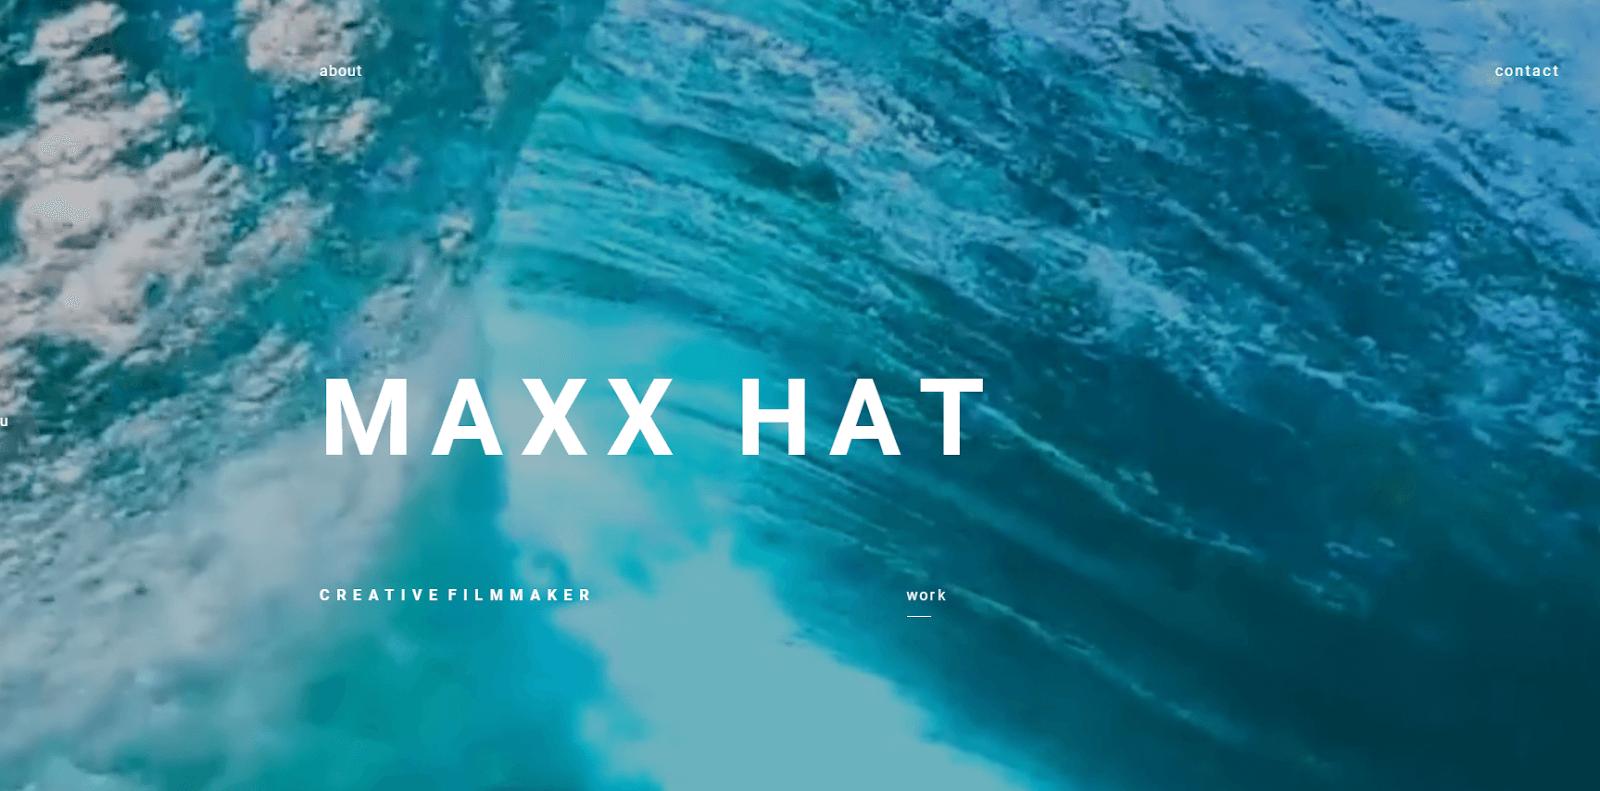 maxx hat Site